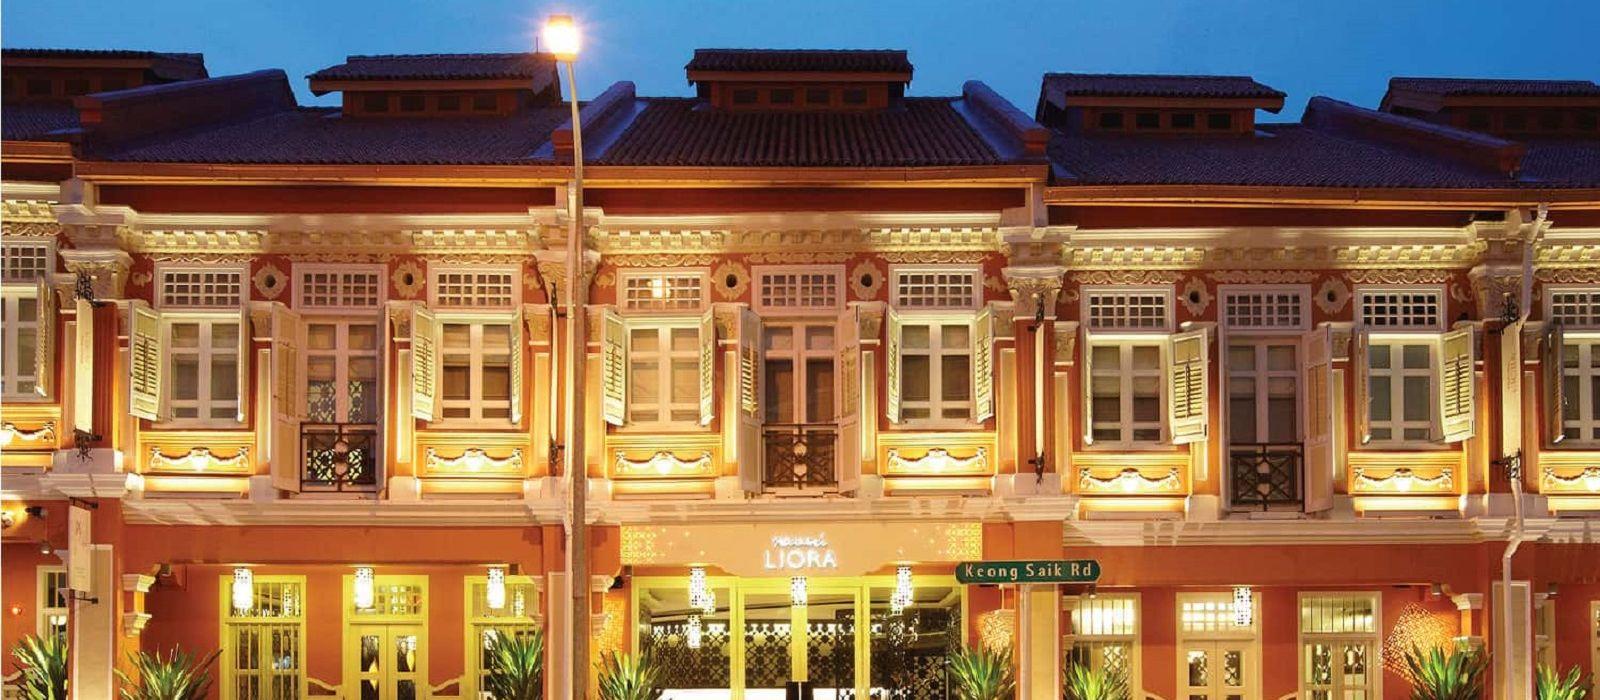 Hotel Naumi Liora Singapore